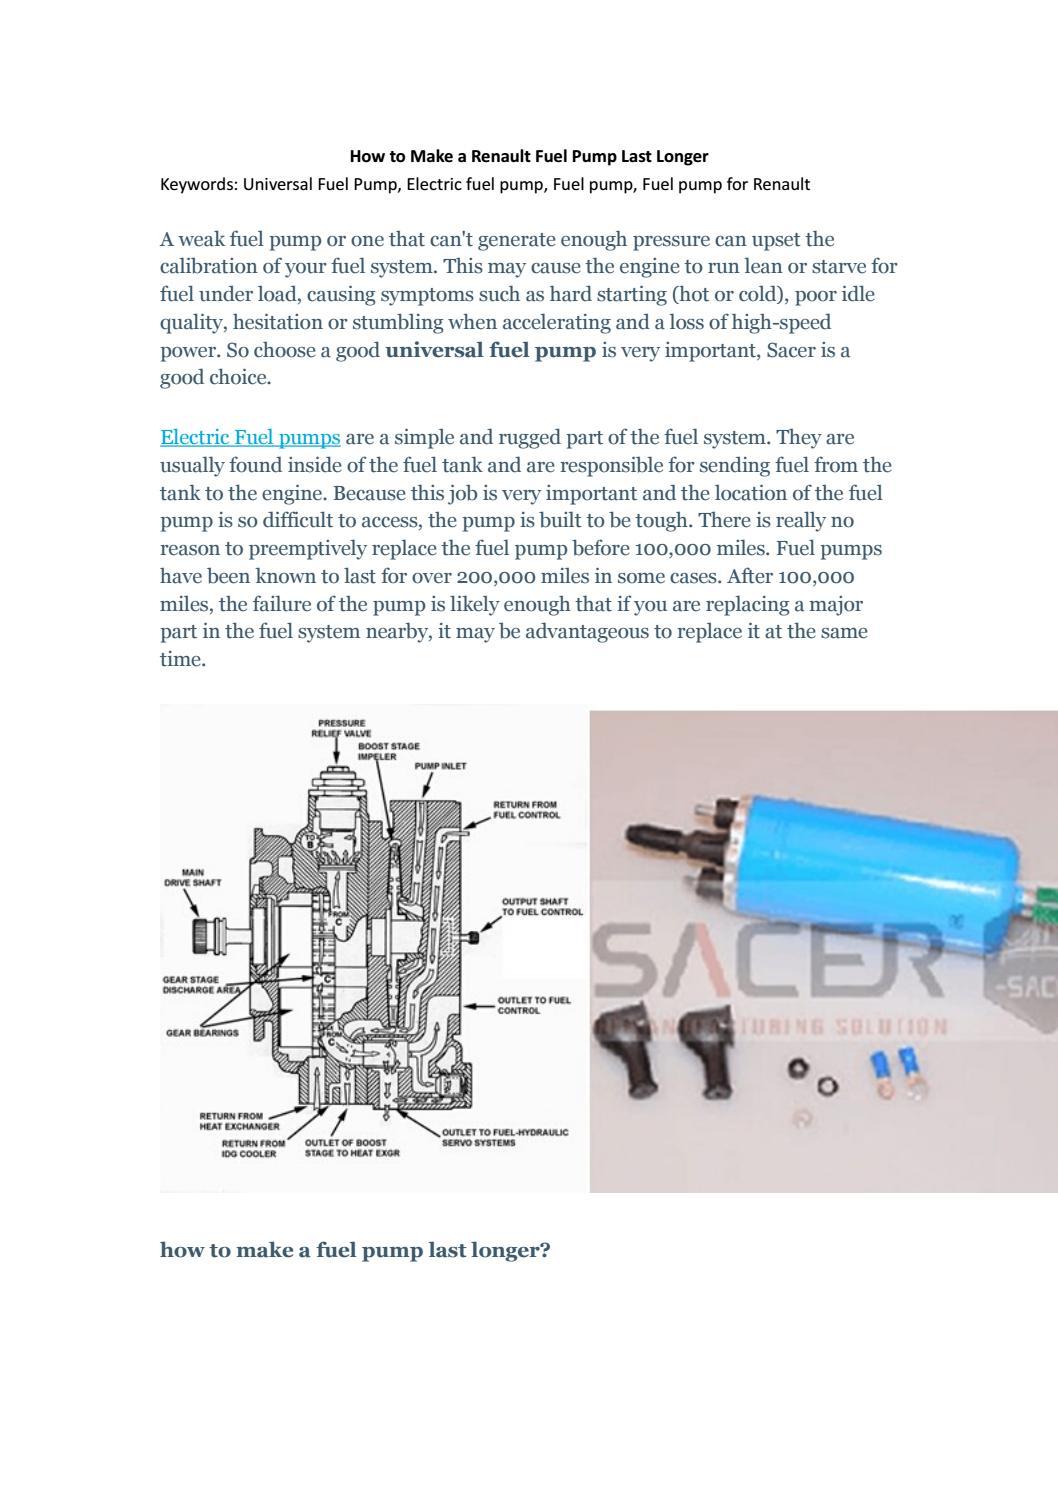 Renault Fuel Pump Diagram Wiring Manual Start How To Make A Last Longer Sacer Ltd By David Oy Megane 89 S10